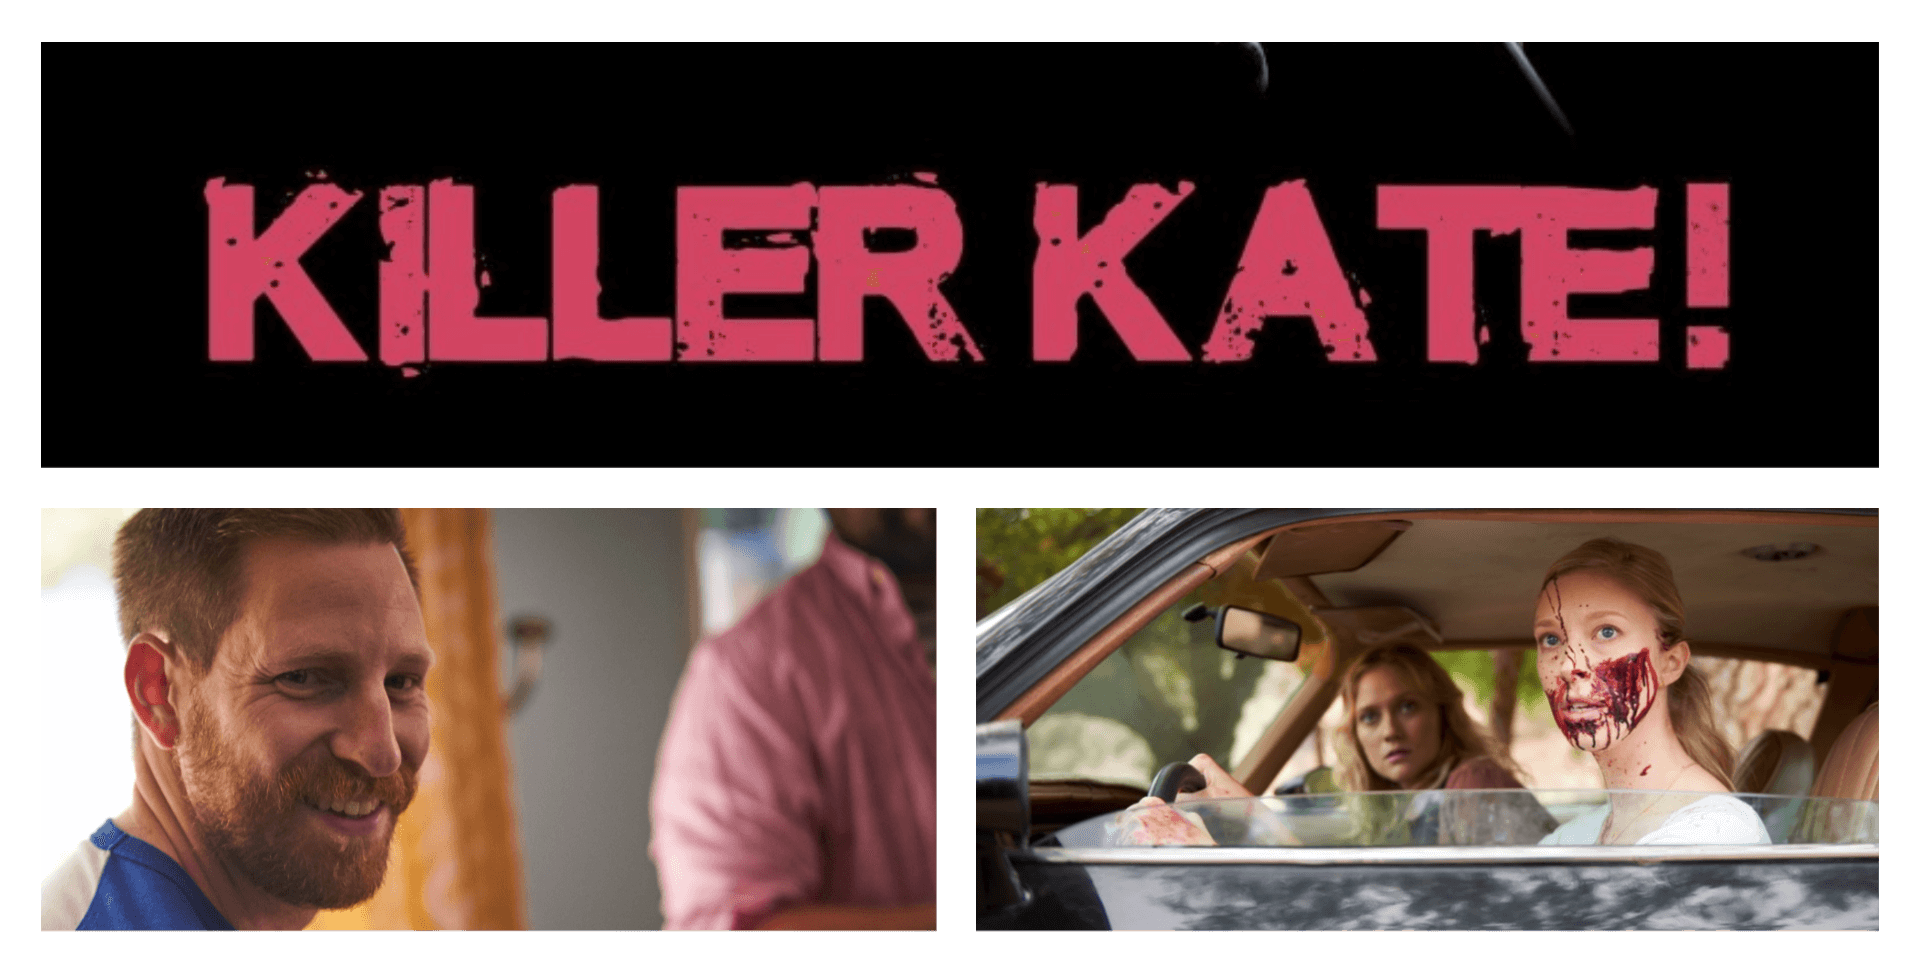 Killer Kate! - Interview with Director Elliot Feld